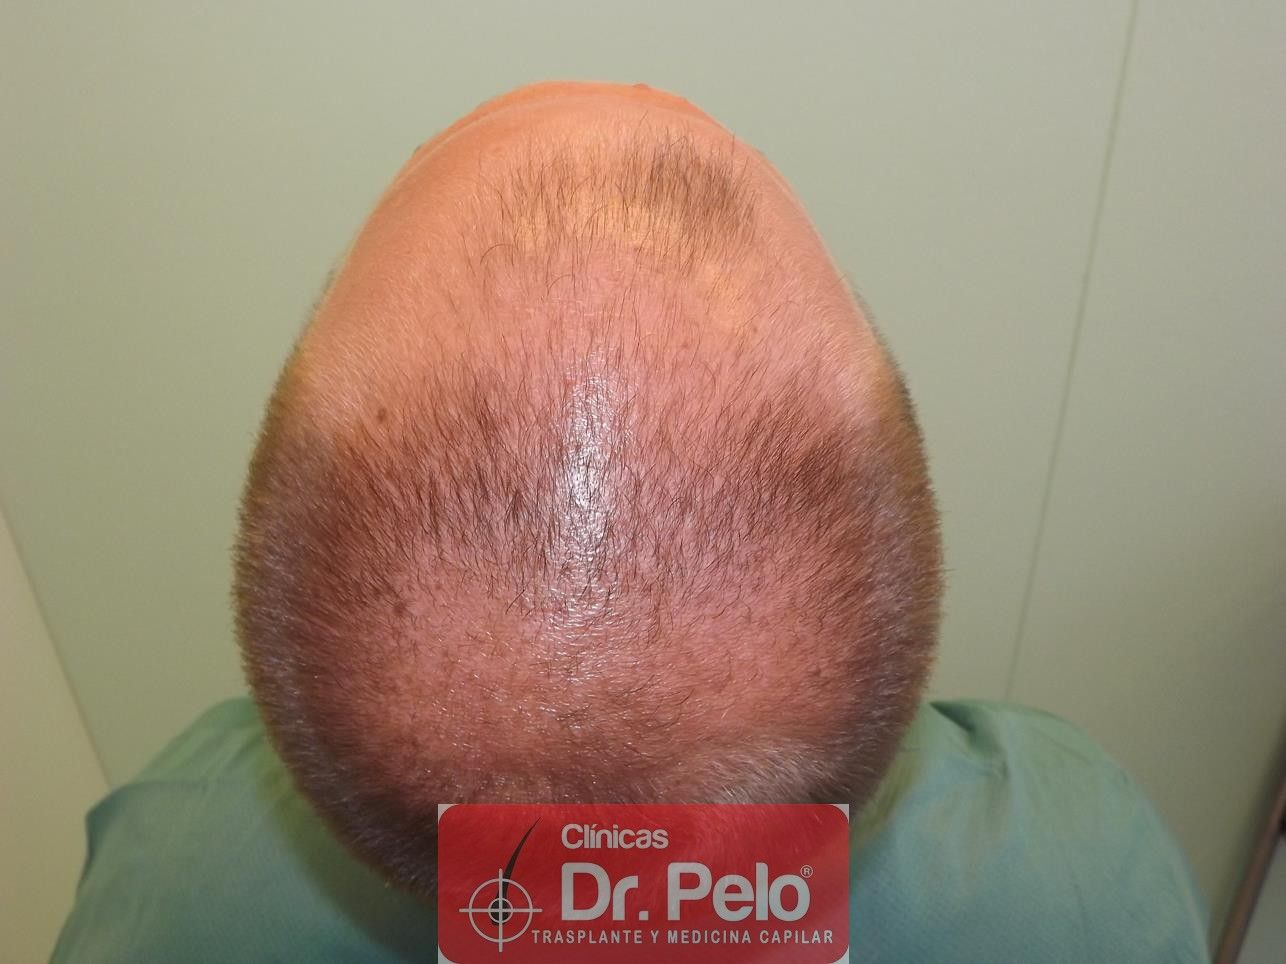 [Imagen: trasplante-pelo-fueDSCF8125-Copy.jpg]